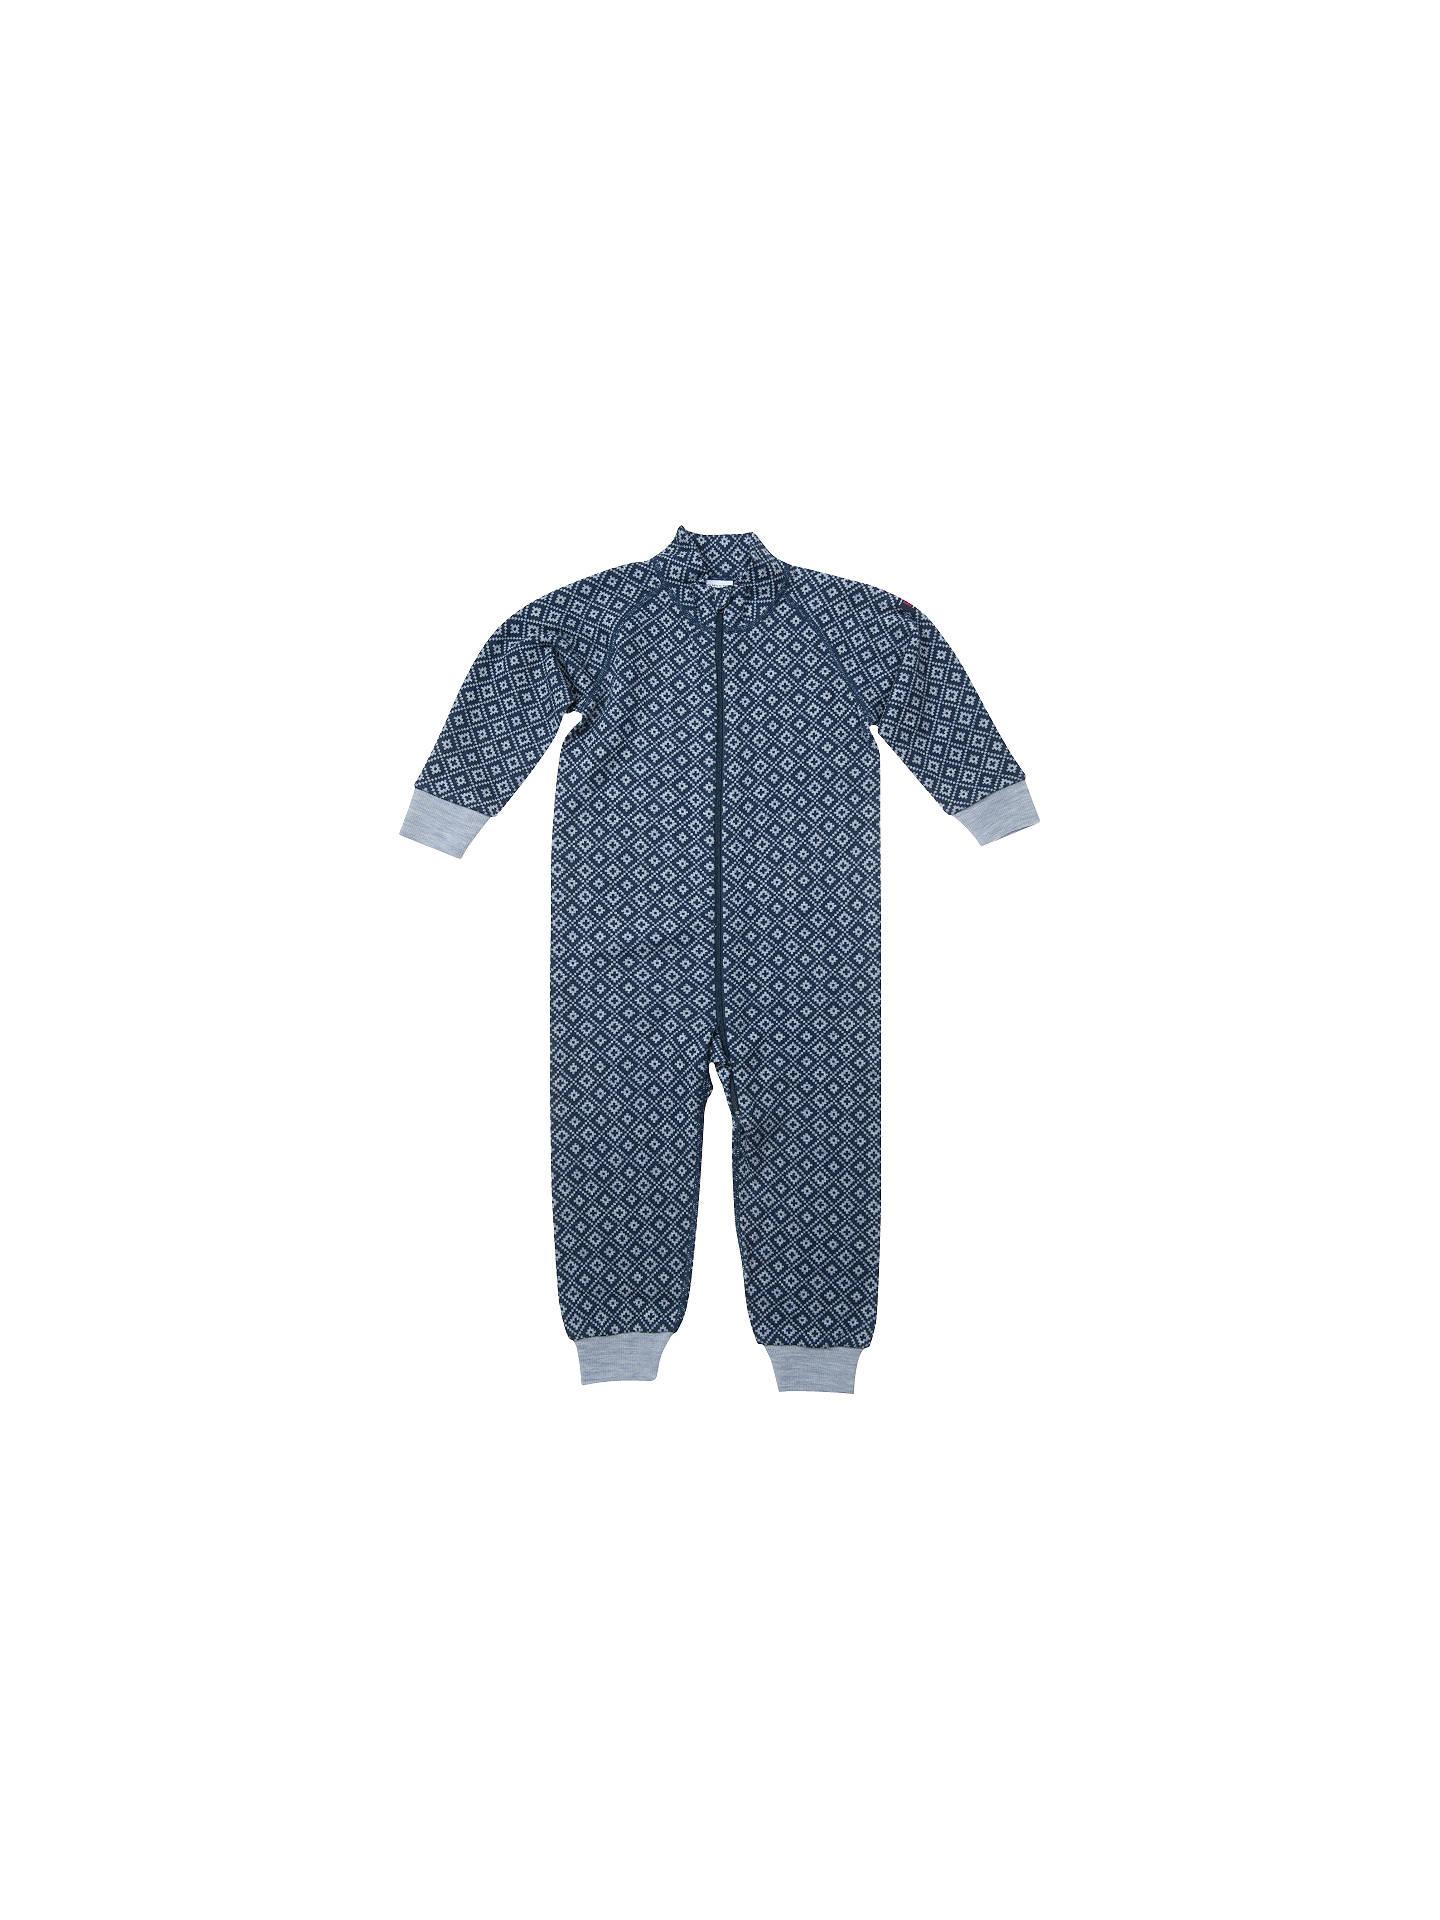 3540de64c3d6 Polarn O. Pyret Baby Merino Wool Snowflake Romper